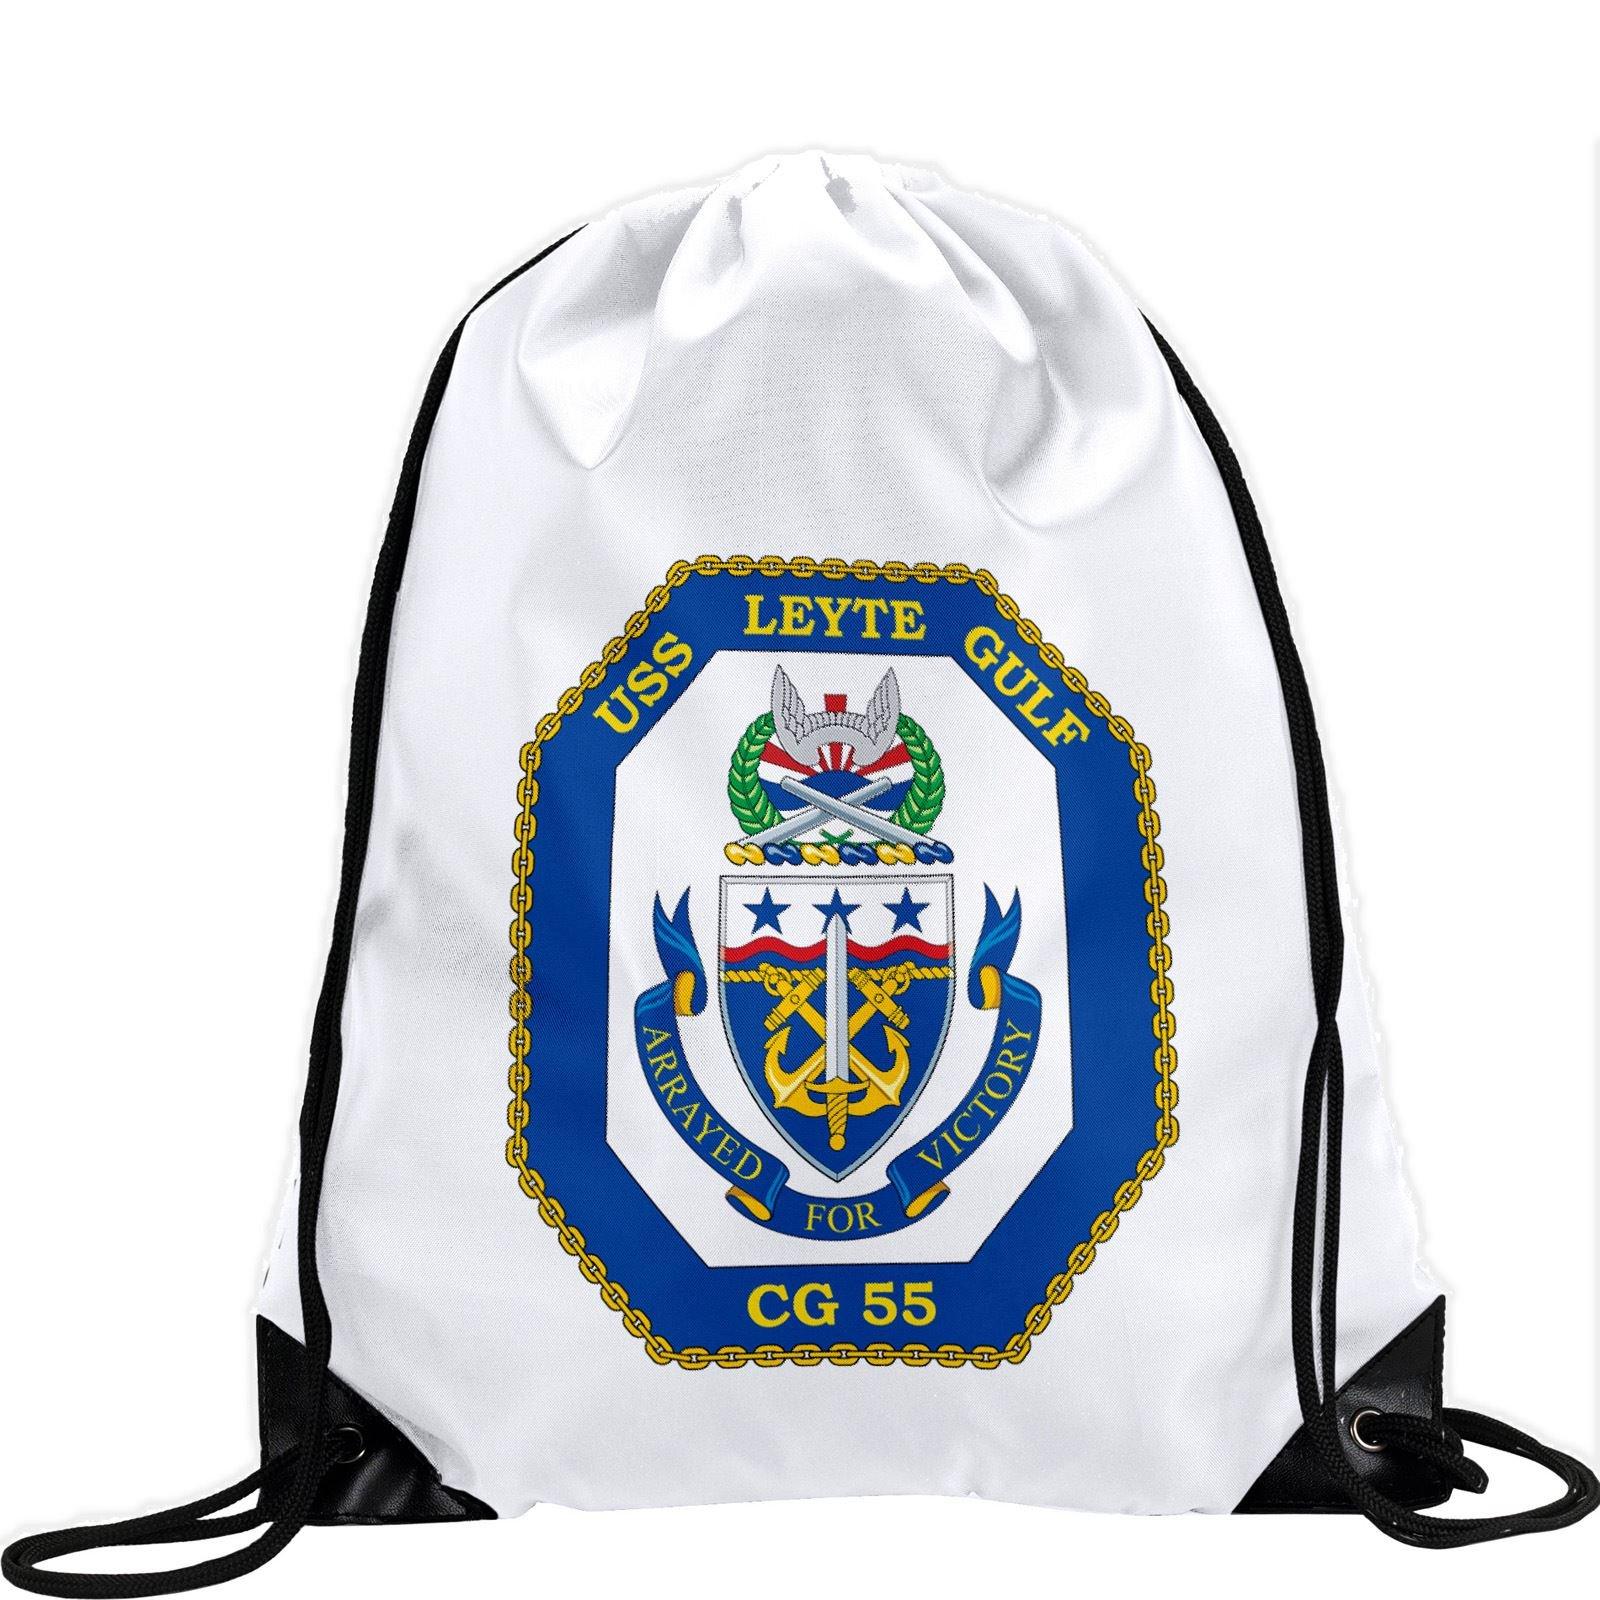 Large Drawstring Bag with US Navy USS Leyte Gulf (CG 55), cruiser emblem (crest) - Long lasting vibrant image